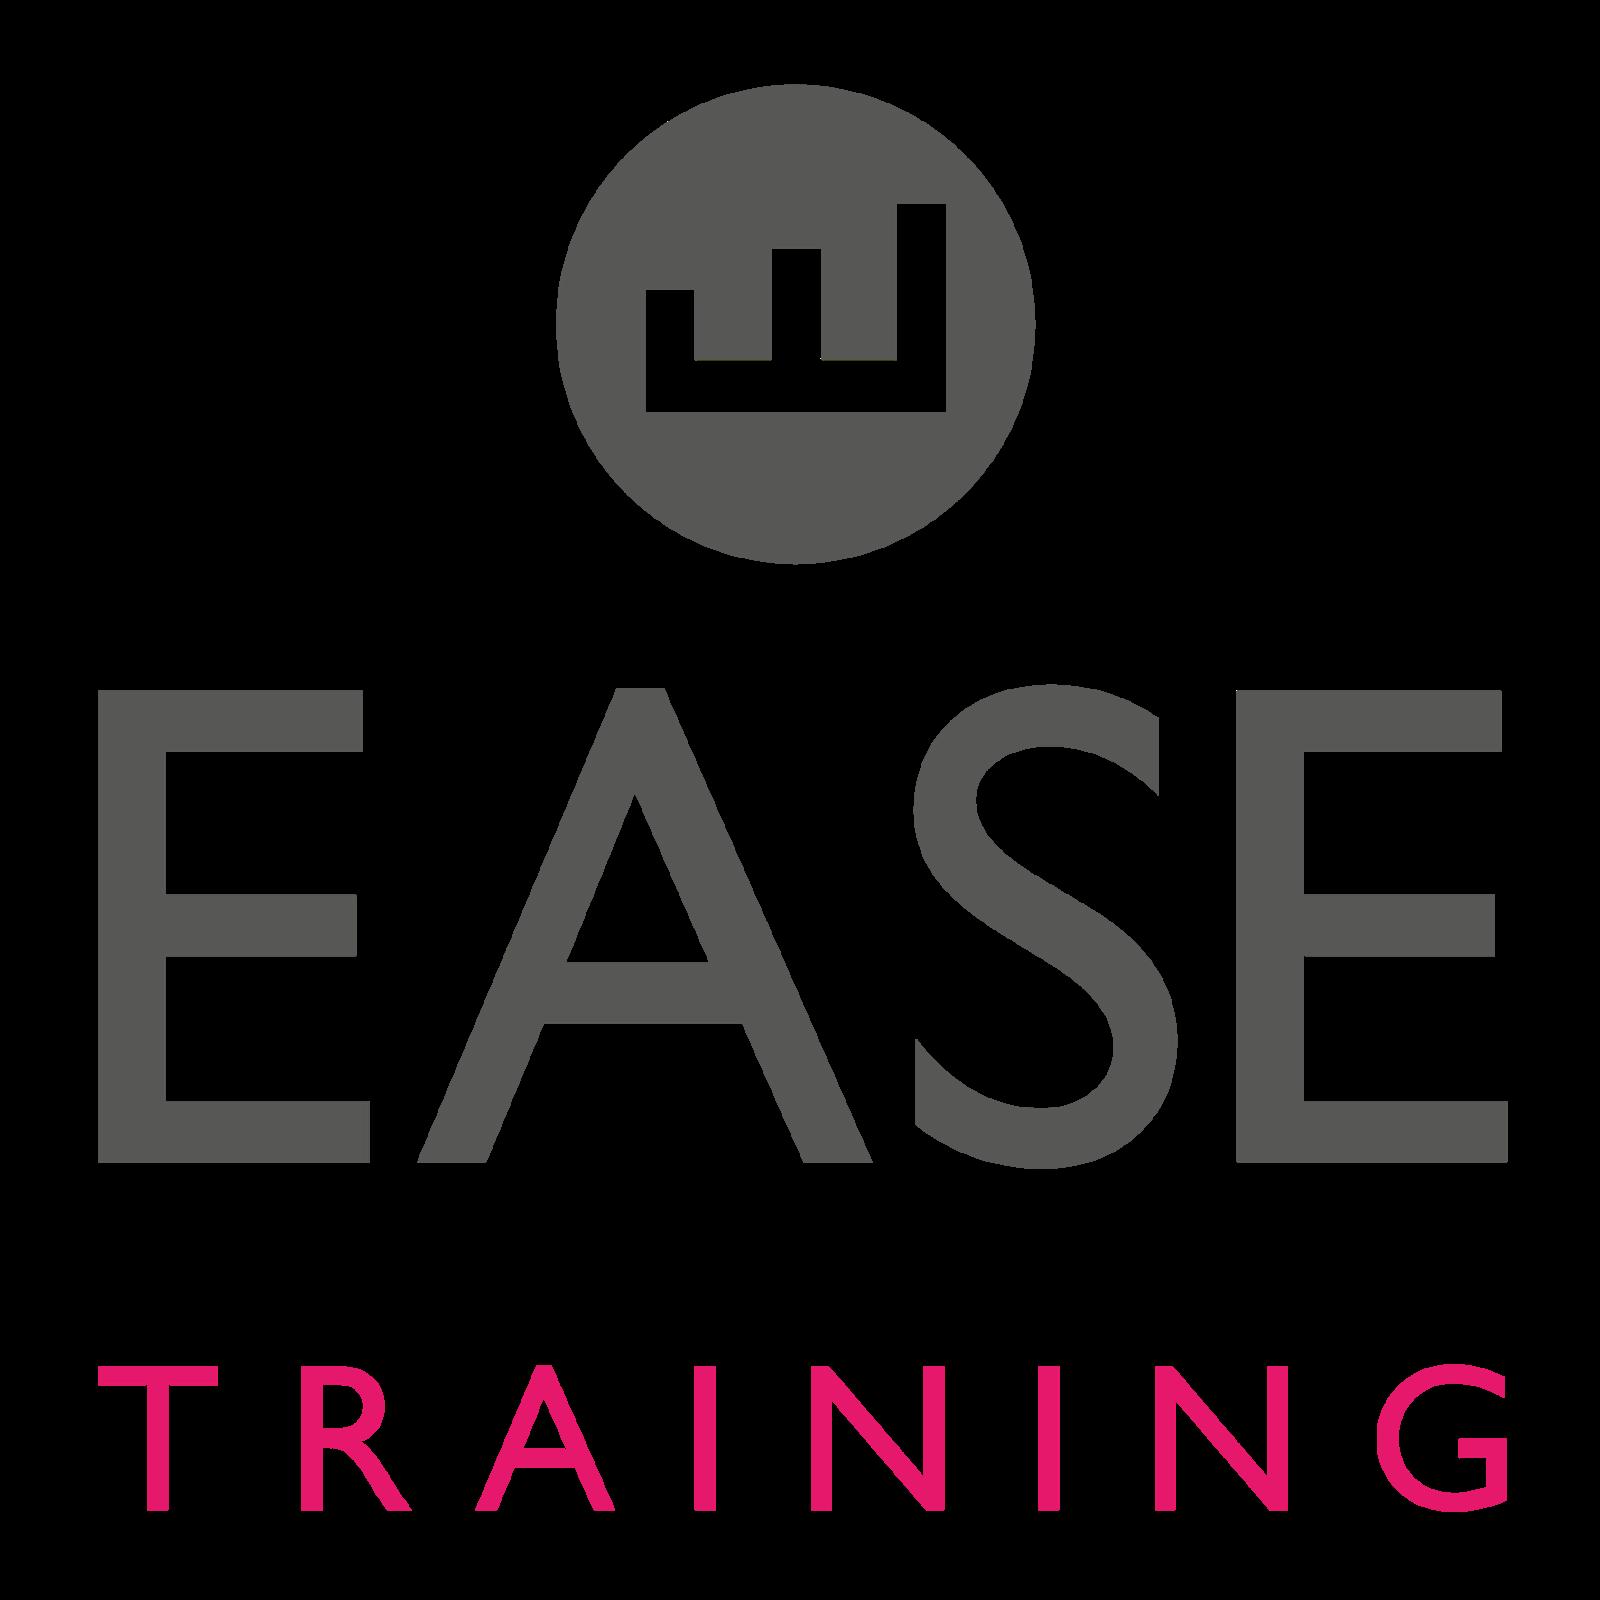 Ease Training